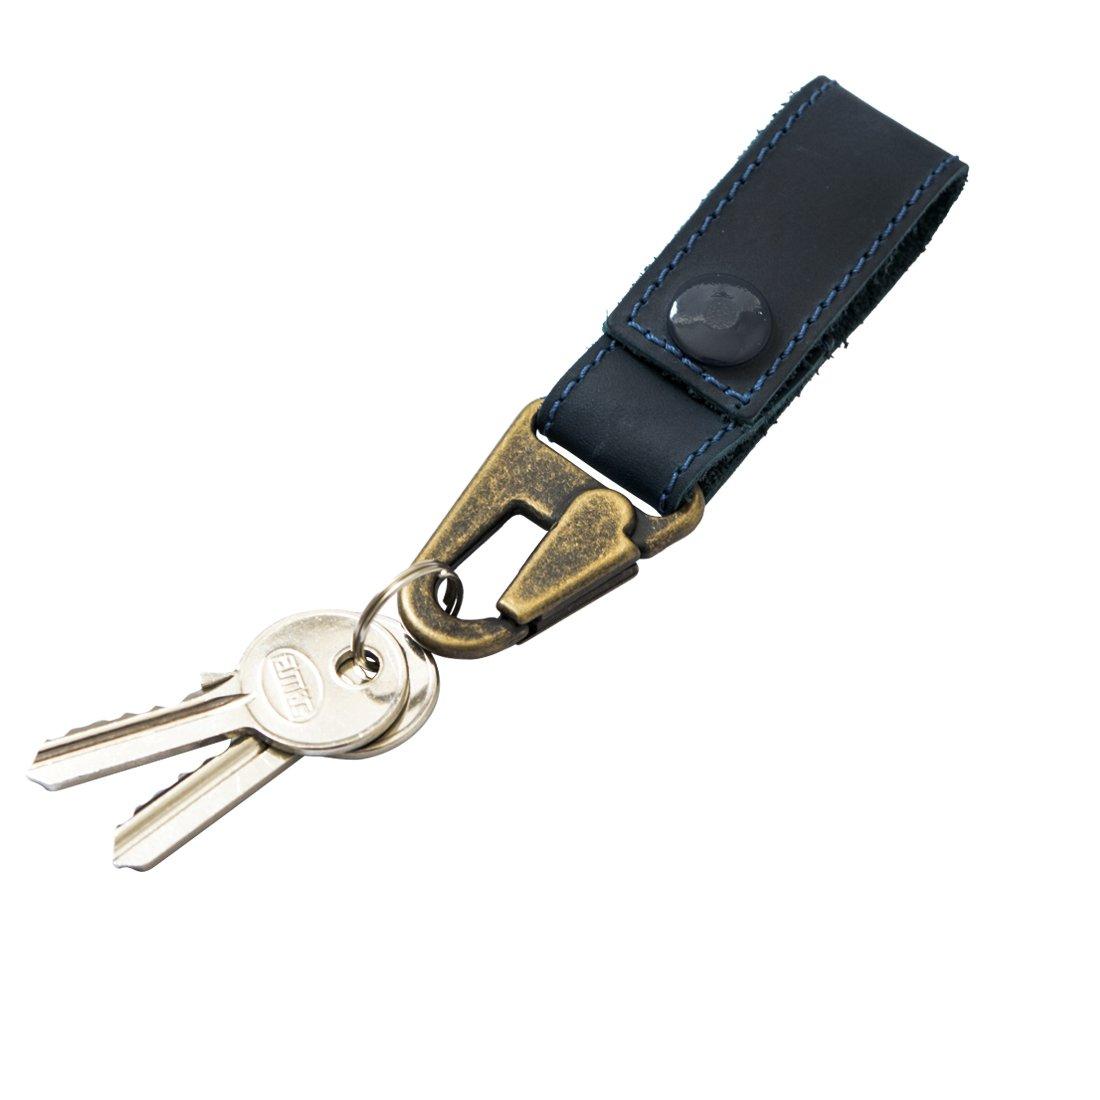 Rustic Leather Key Ring Holder Handmade by Hide & Drink :: Slate Blue